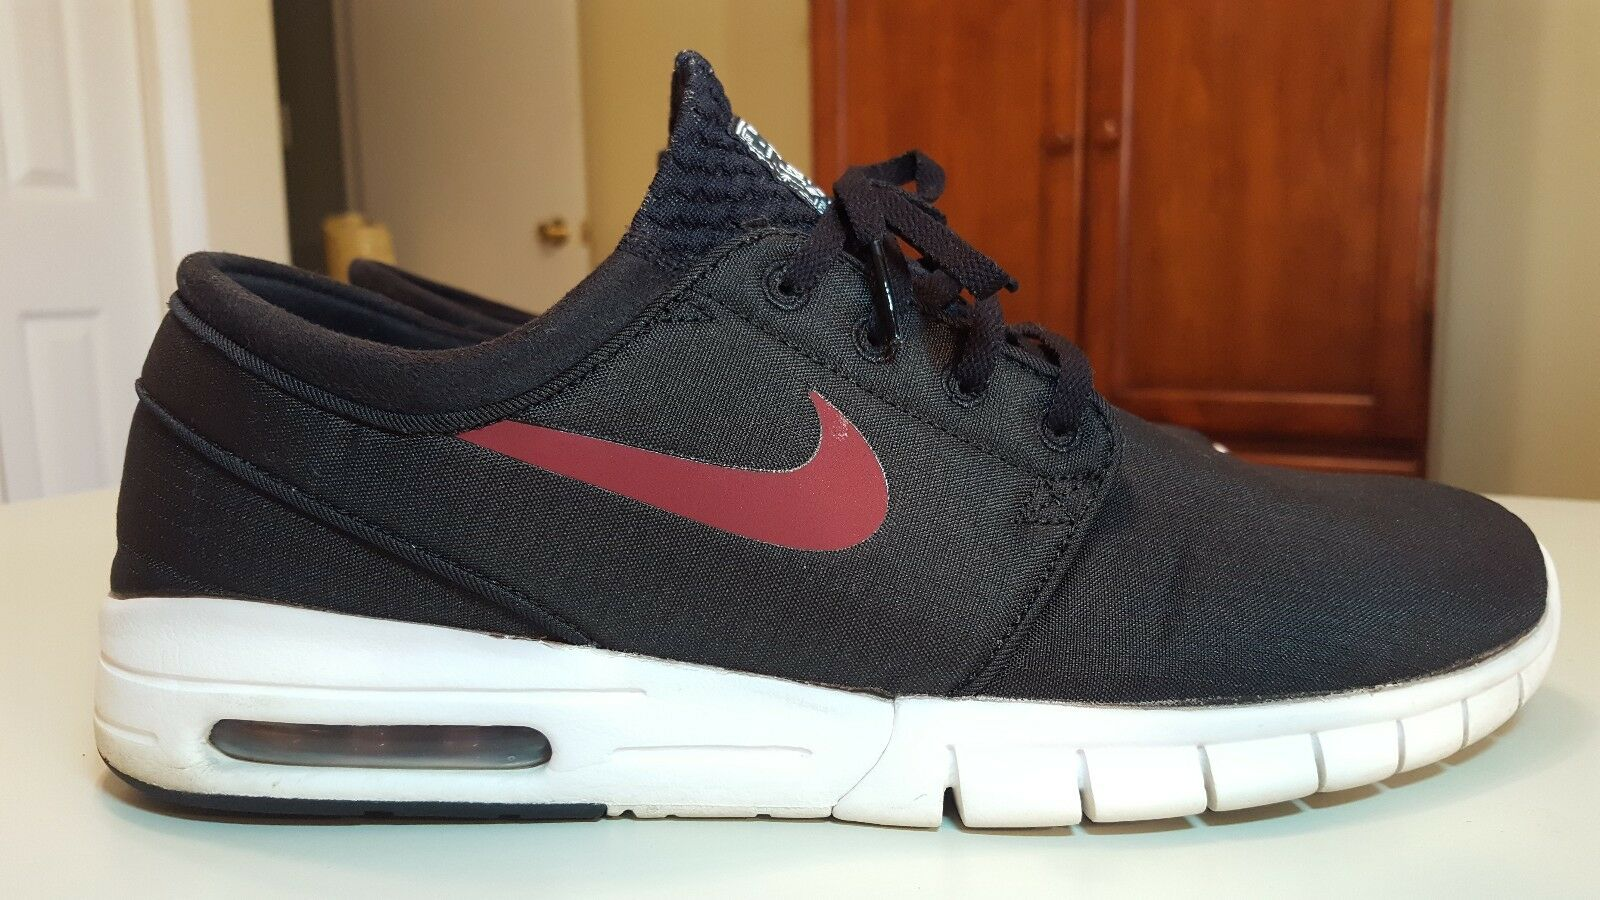 Nike STEFAN Para JANOSKI MAX, 631303-060, Zapatos Para STEFAN Hombre Skateboarding, Negro fd51aa